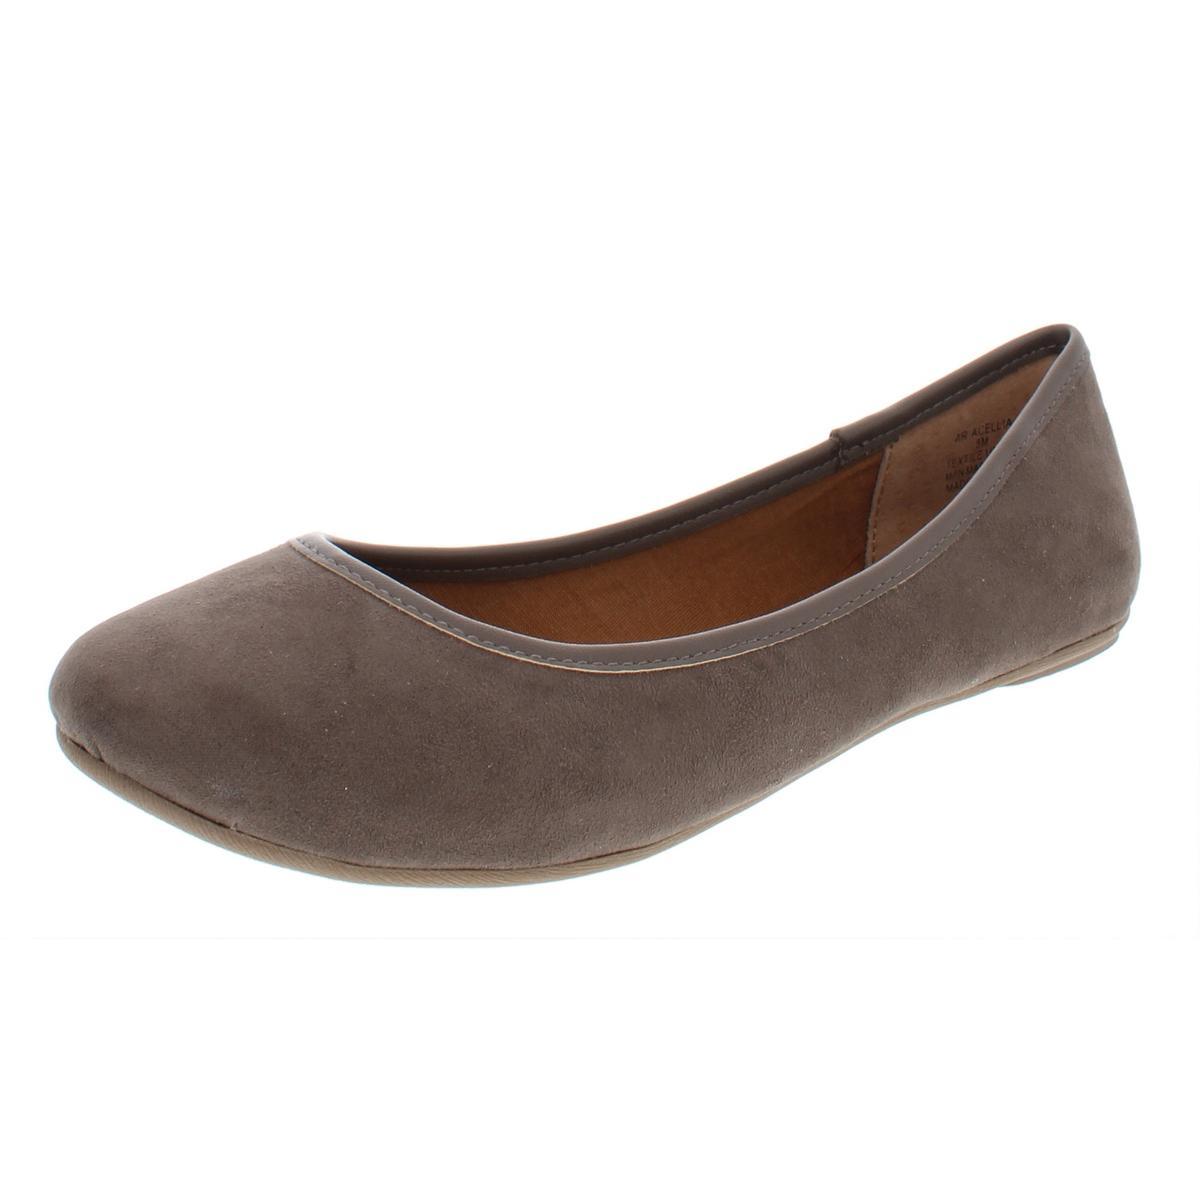 American-Rag-Womens-Cellia-Contrast-Trim-Slip-On-Ballet-Flats-Shoes-BHFO-6452 thumbnail 11